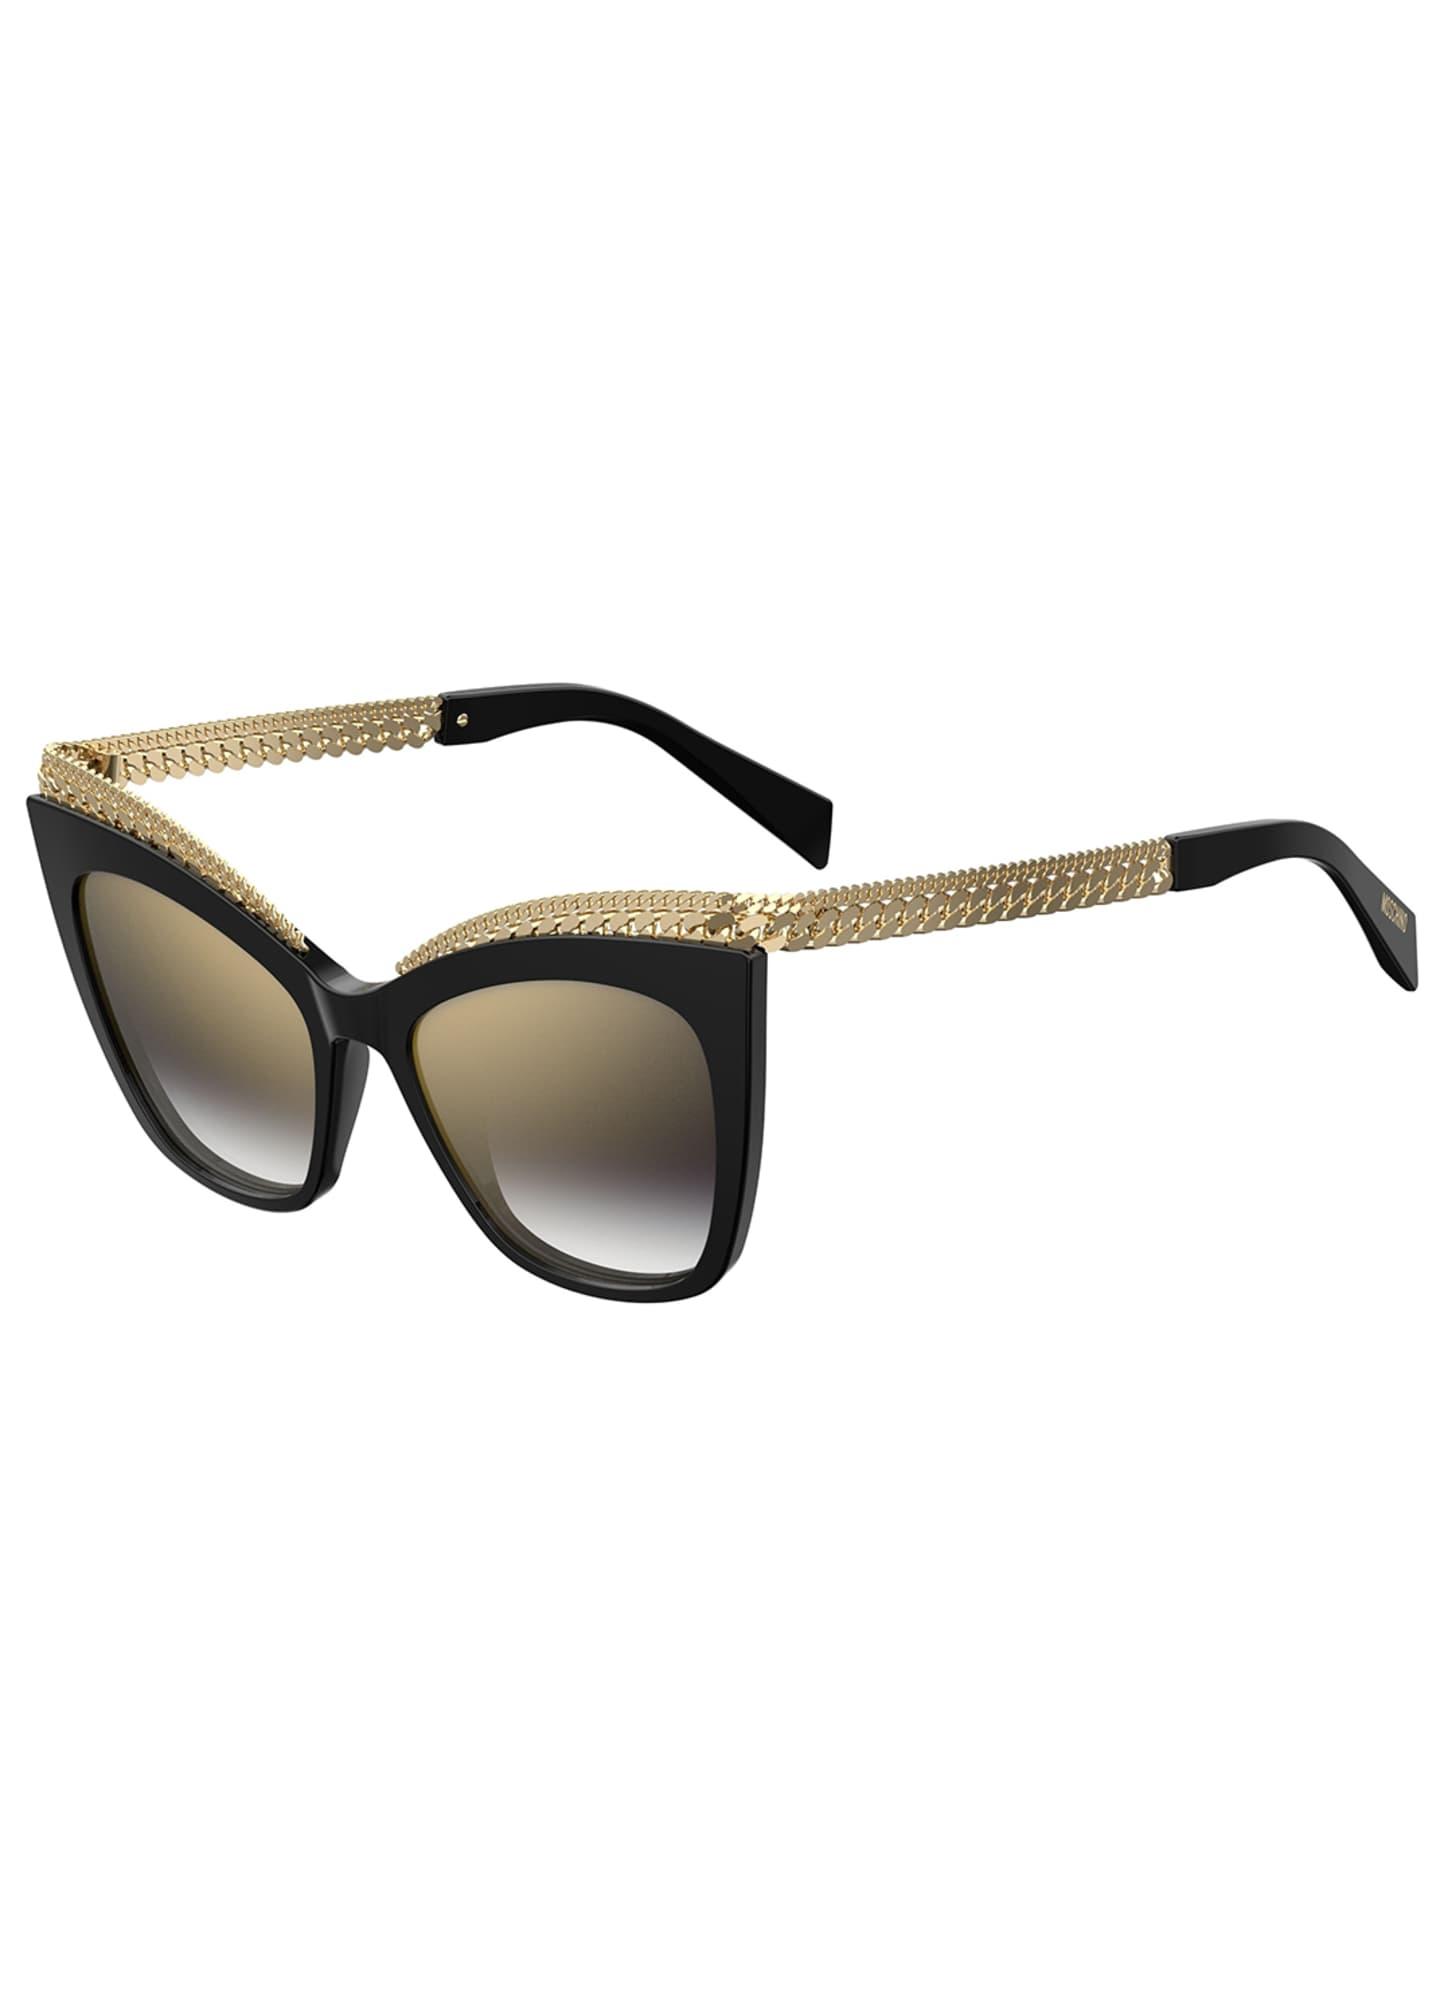 Moschino Mirrored Cat-Eye Sunglasses w/ Metal Curb Chain